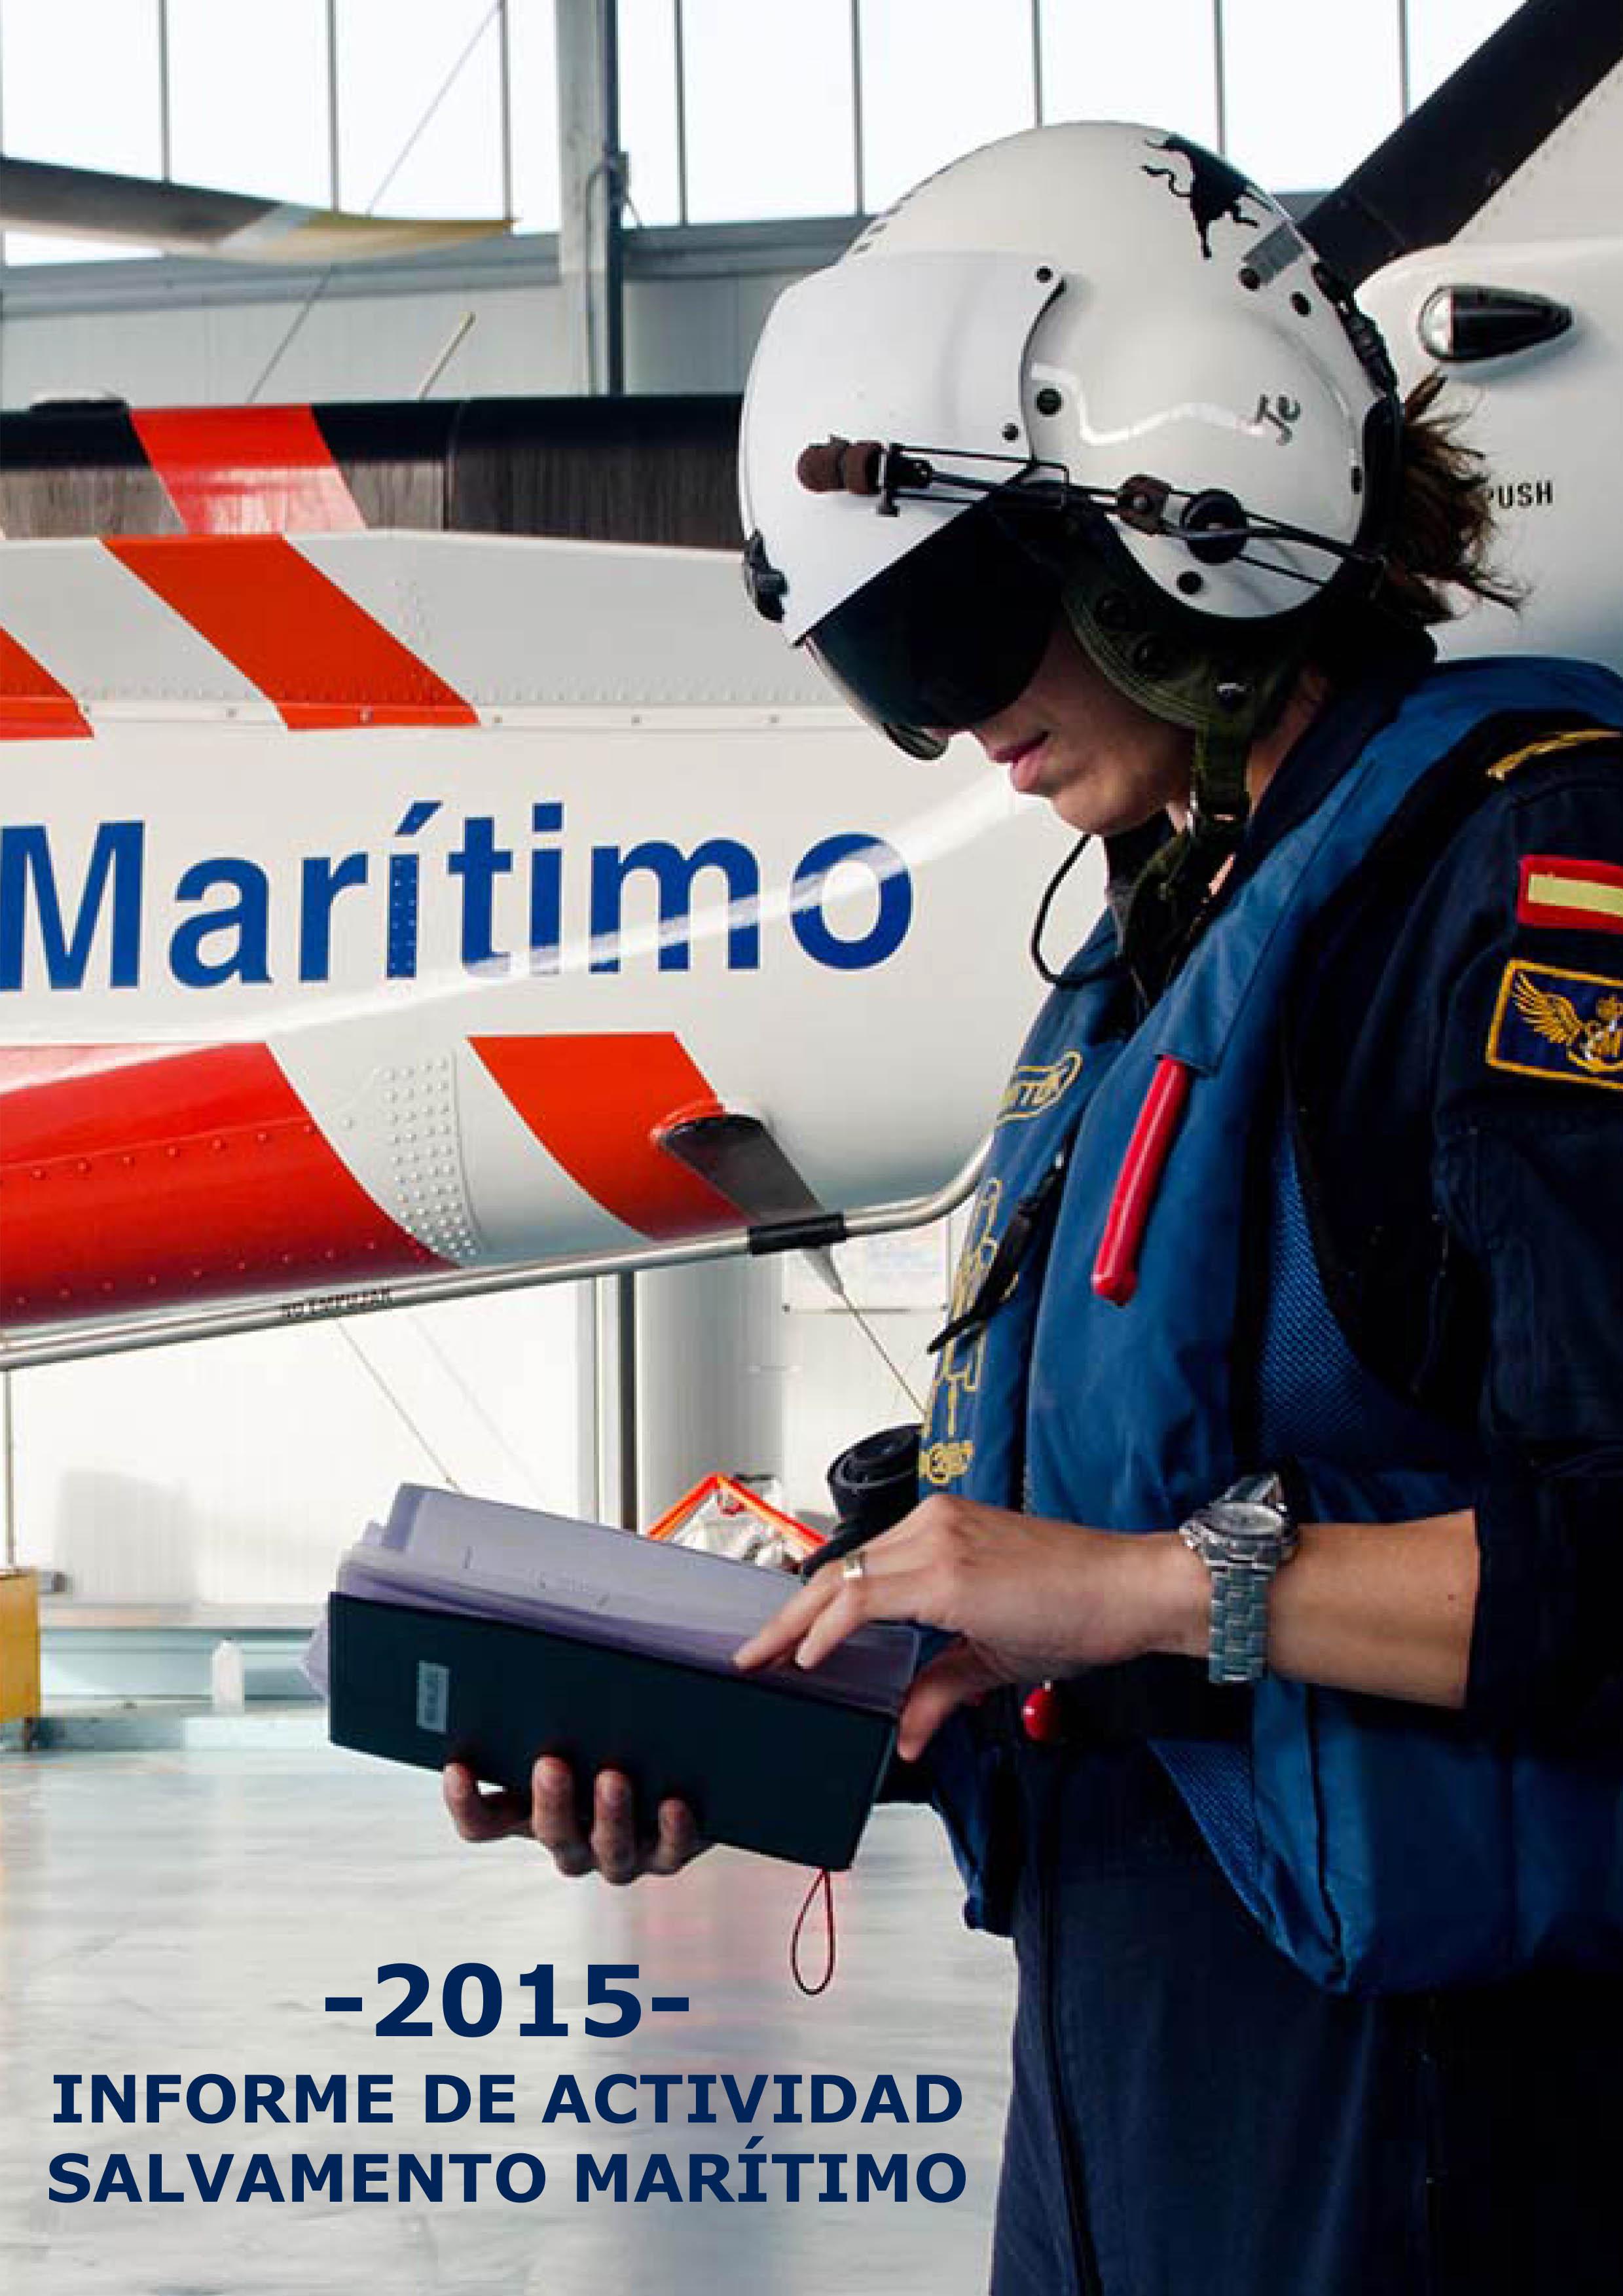 Informe de actividad Salvamento Marítimo2015